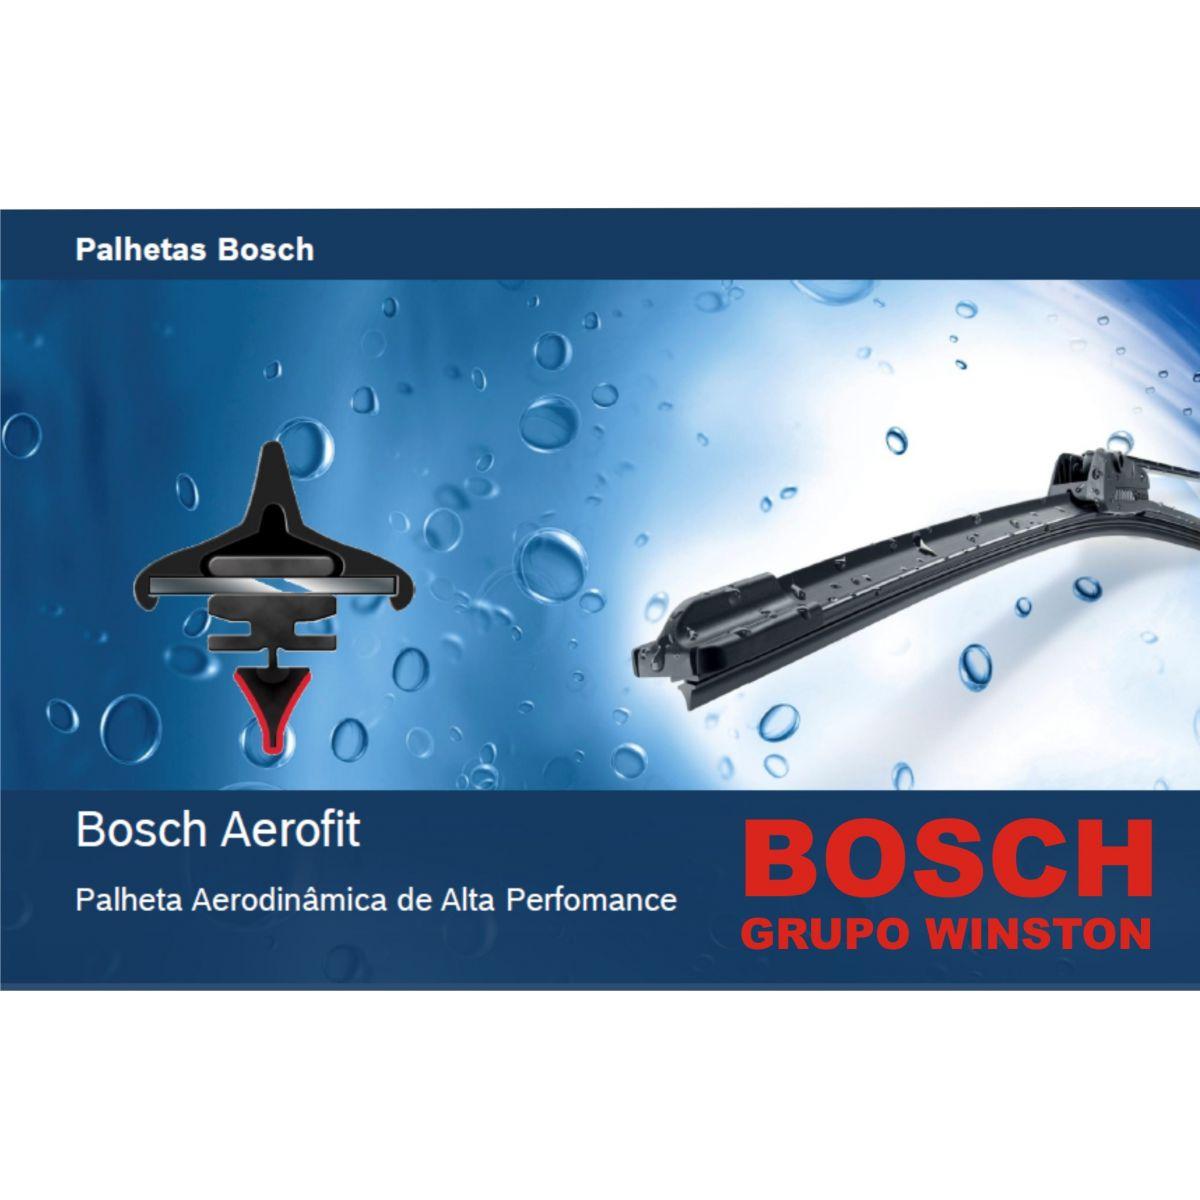 Palheta Bosch Aerofit Limpador de para brisa Bosch VW Golf II